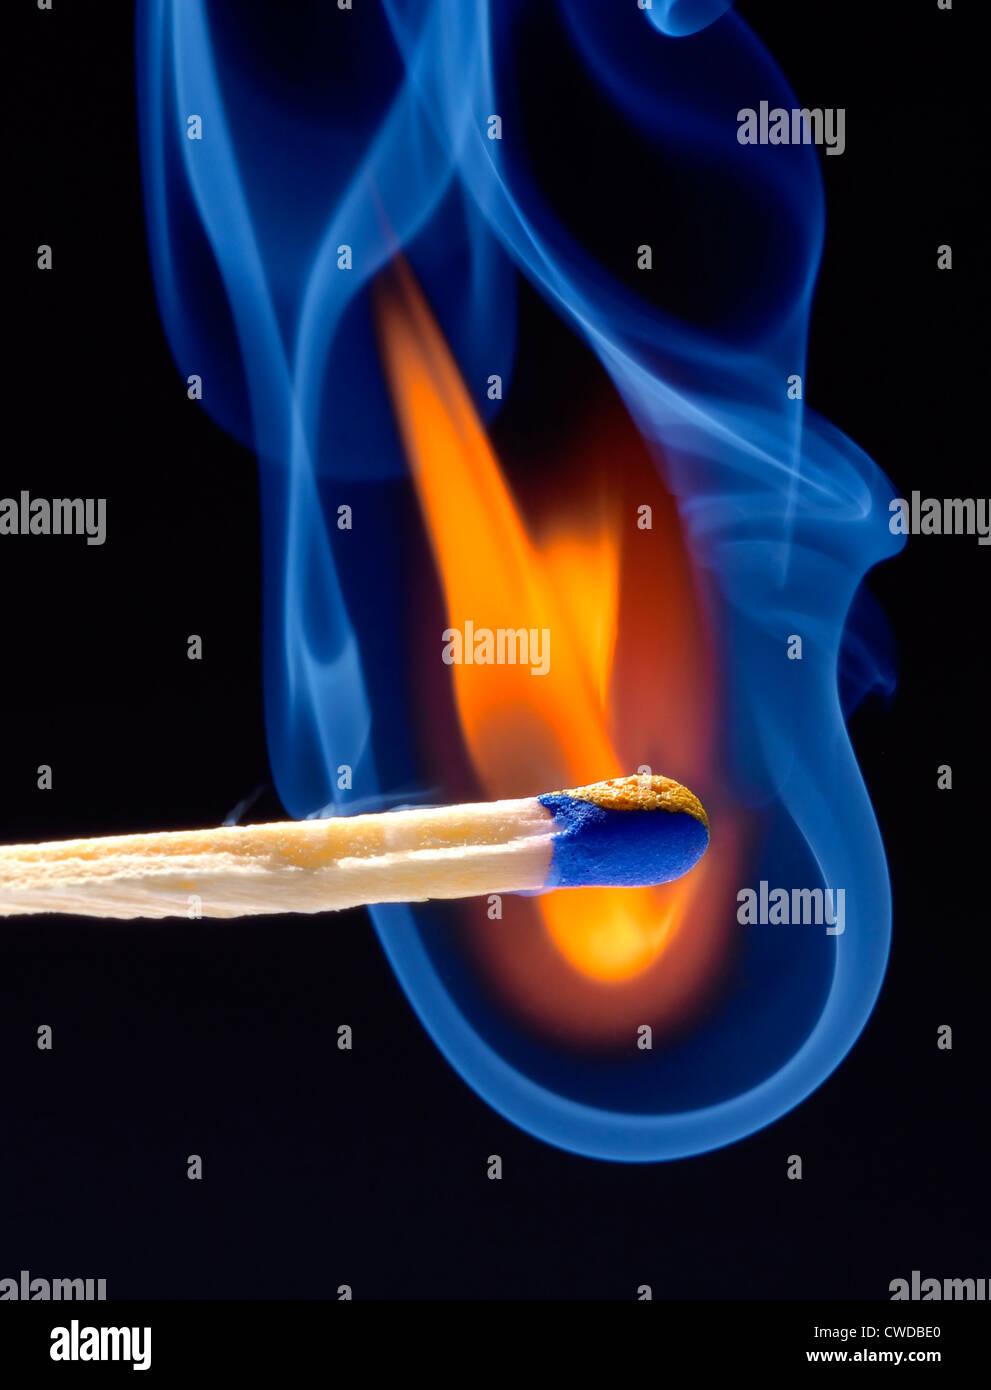 flame,matchstick - Stock Image